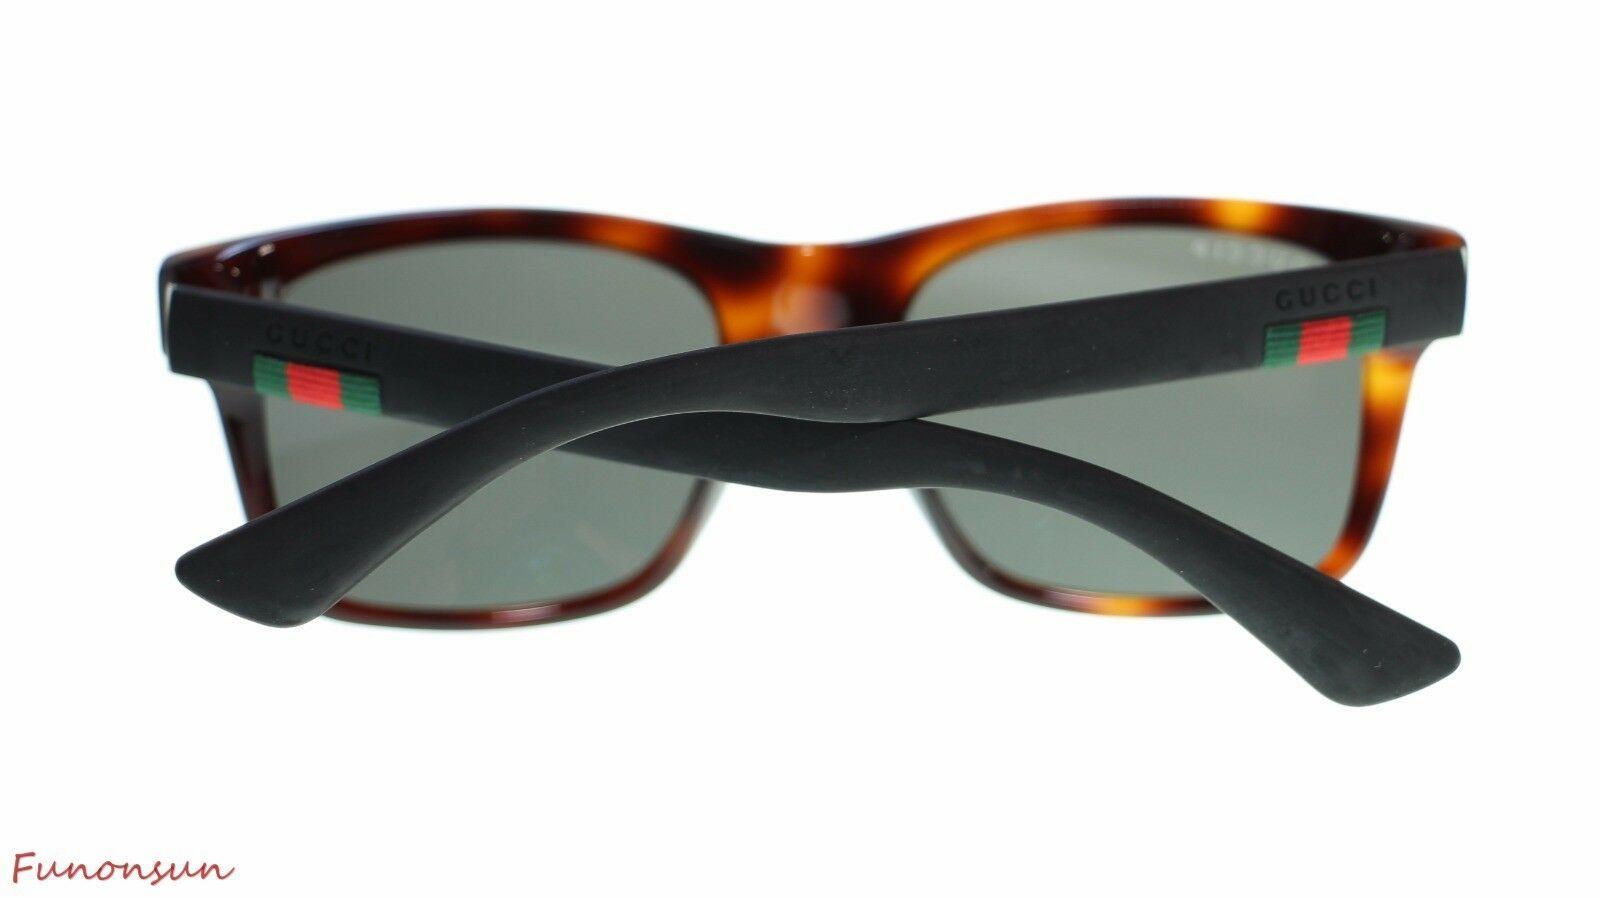 94b92a891a76e Gucci Men Square Sunglasses GG0008S 006 Havana Black Grey Lens 53mm  Authentic